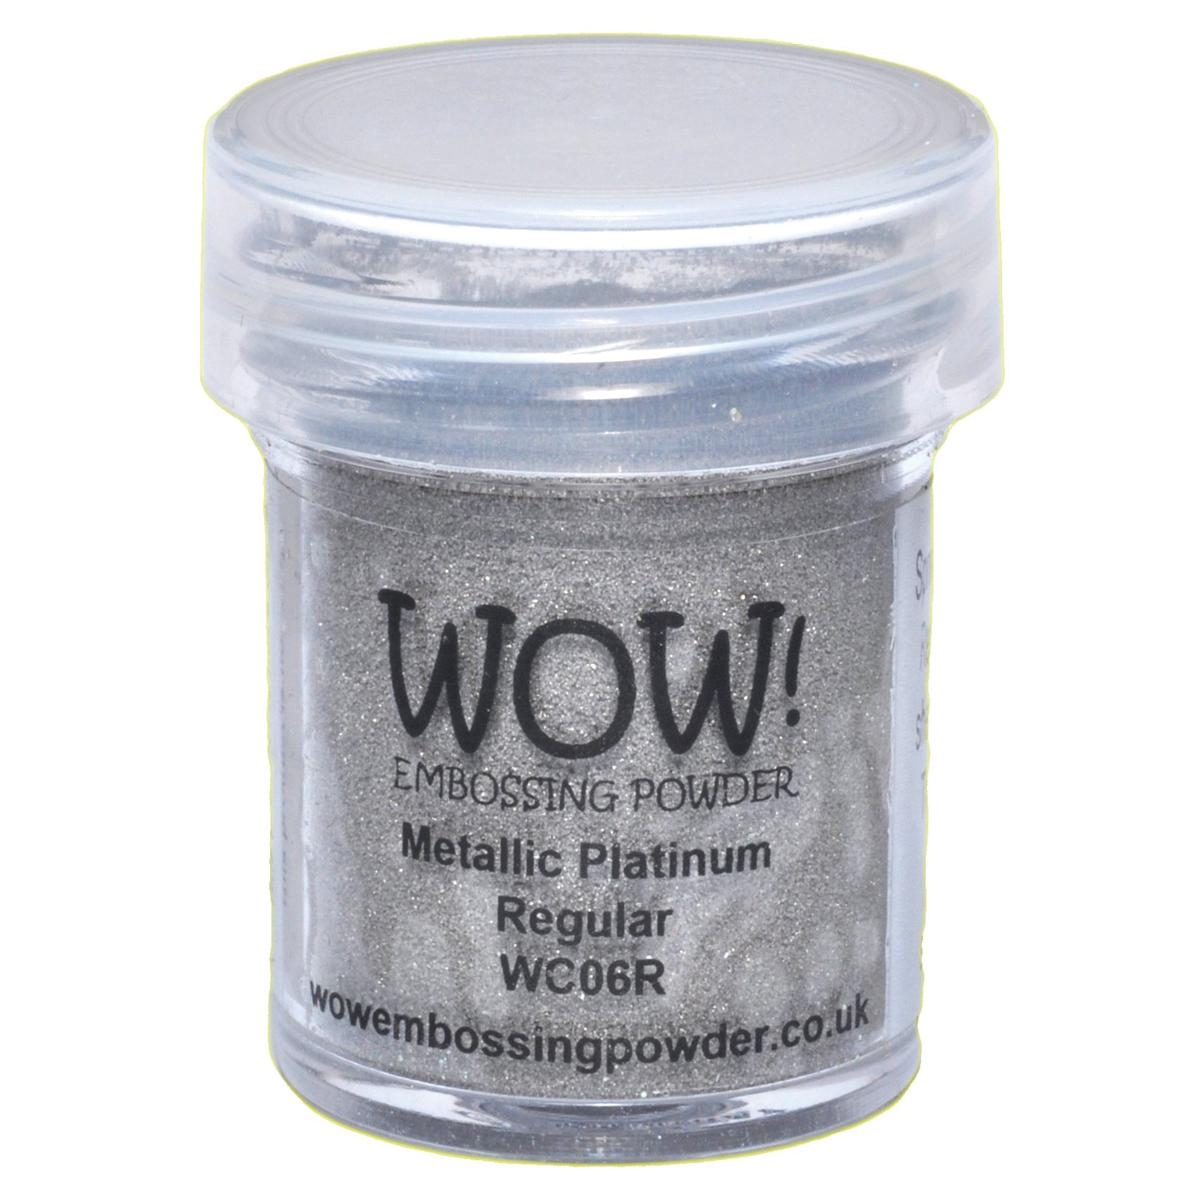 WOW Metallic Platinum Reg